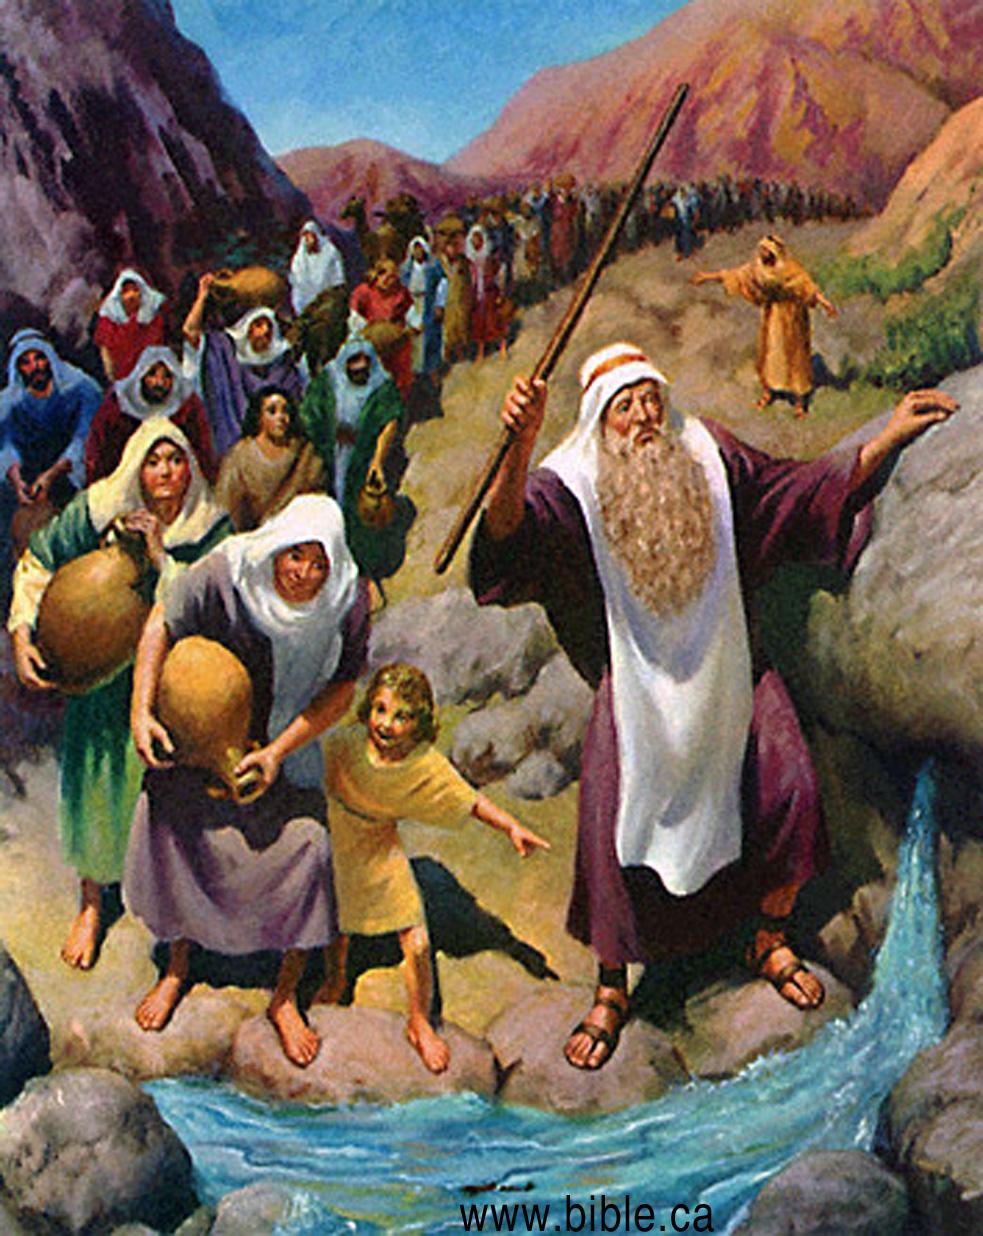 bible-archeology-exodus-kadesh-barnea-water-from-rock-moses